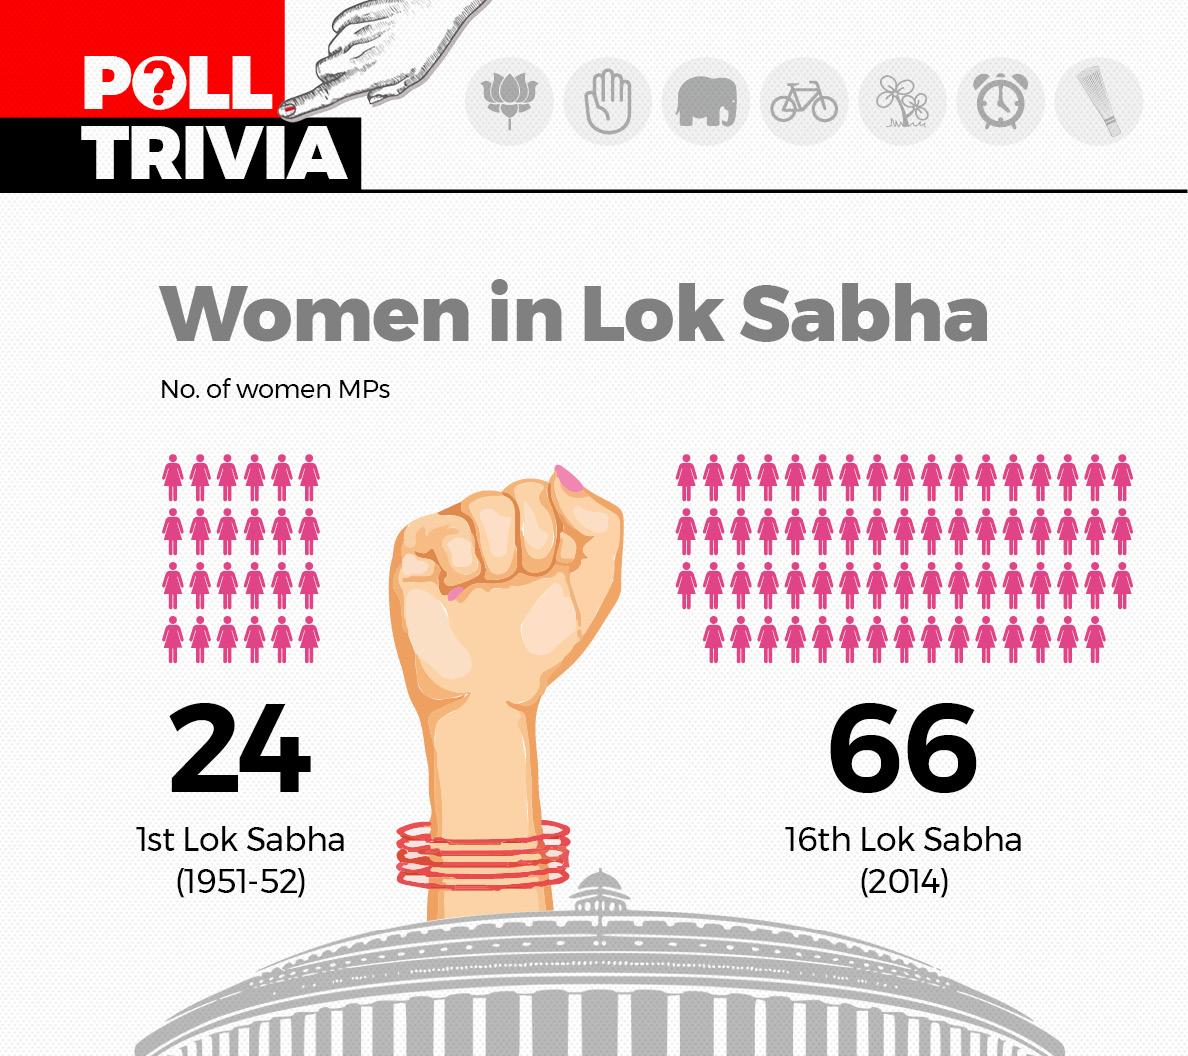 Women in Lok Sabha